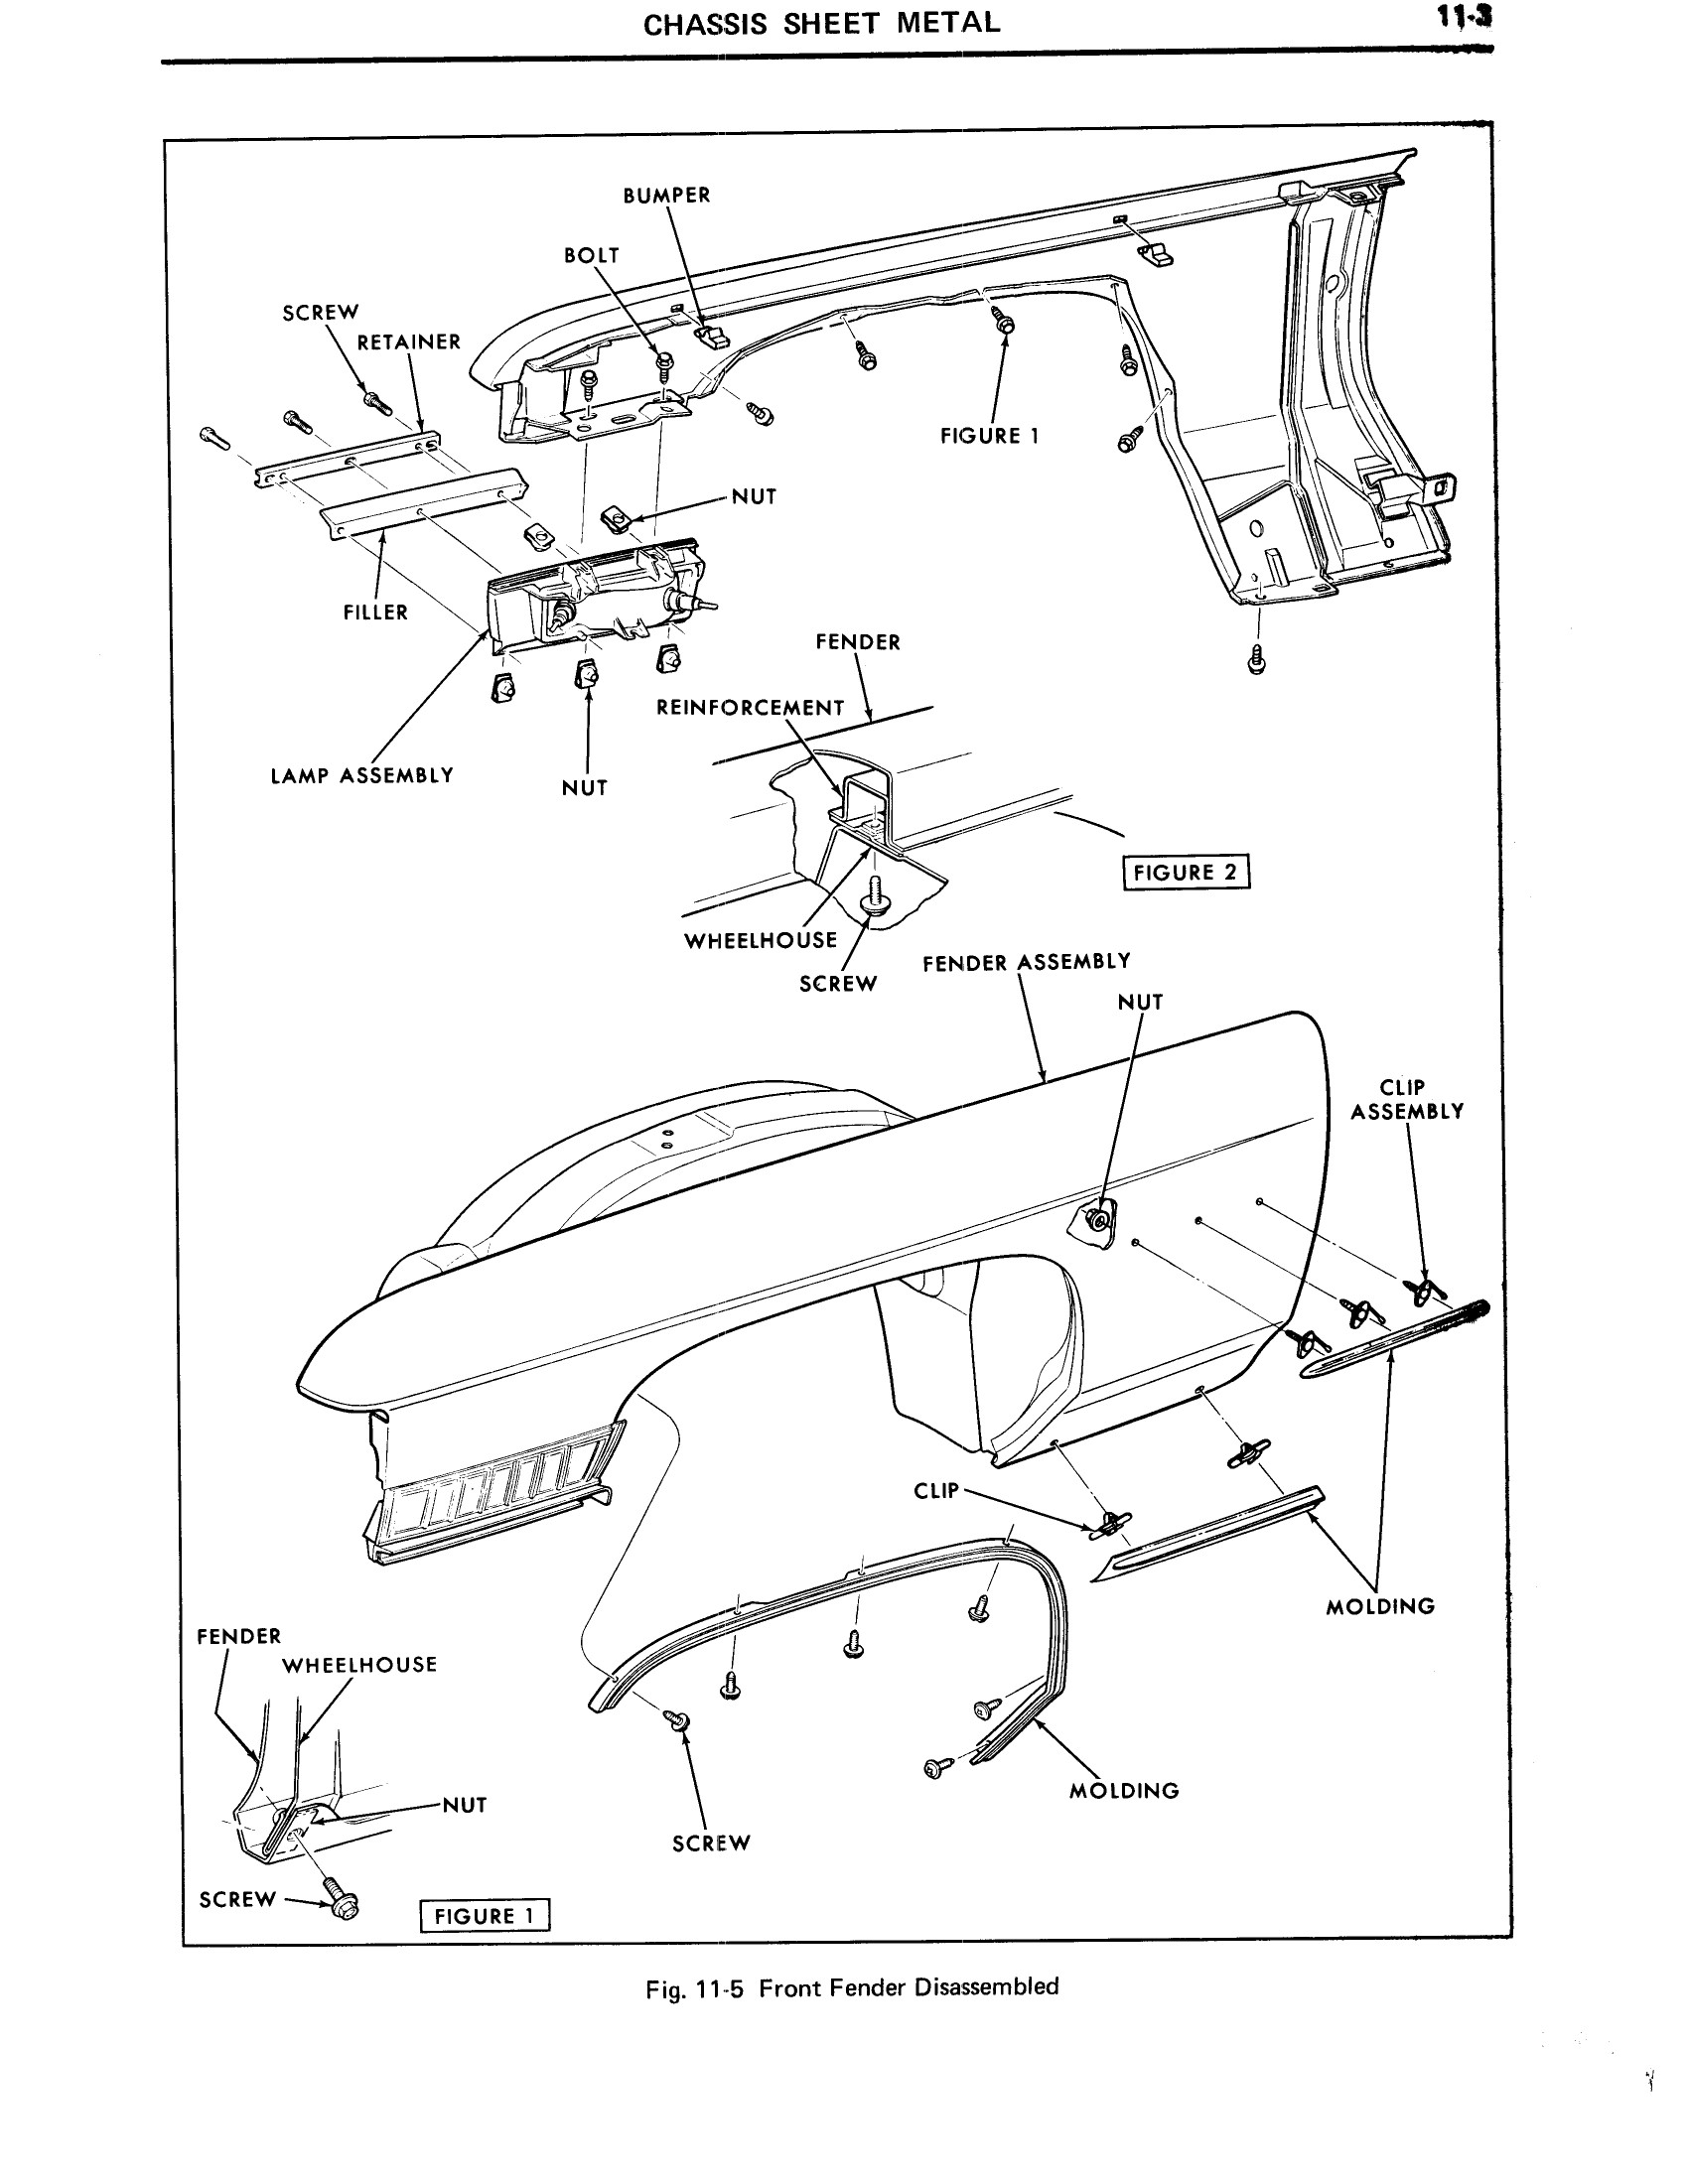 1971 Cadillac Shop Manual- Chassis Sheet Metal Page 3 of 12